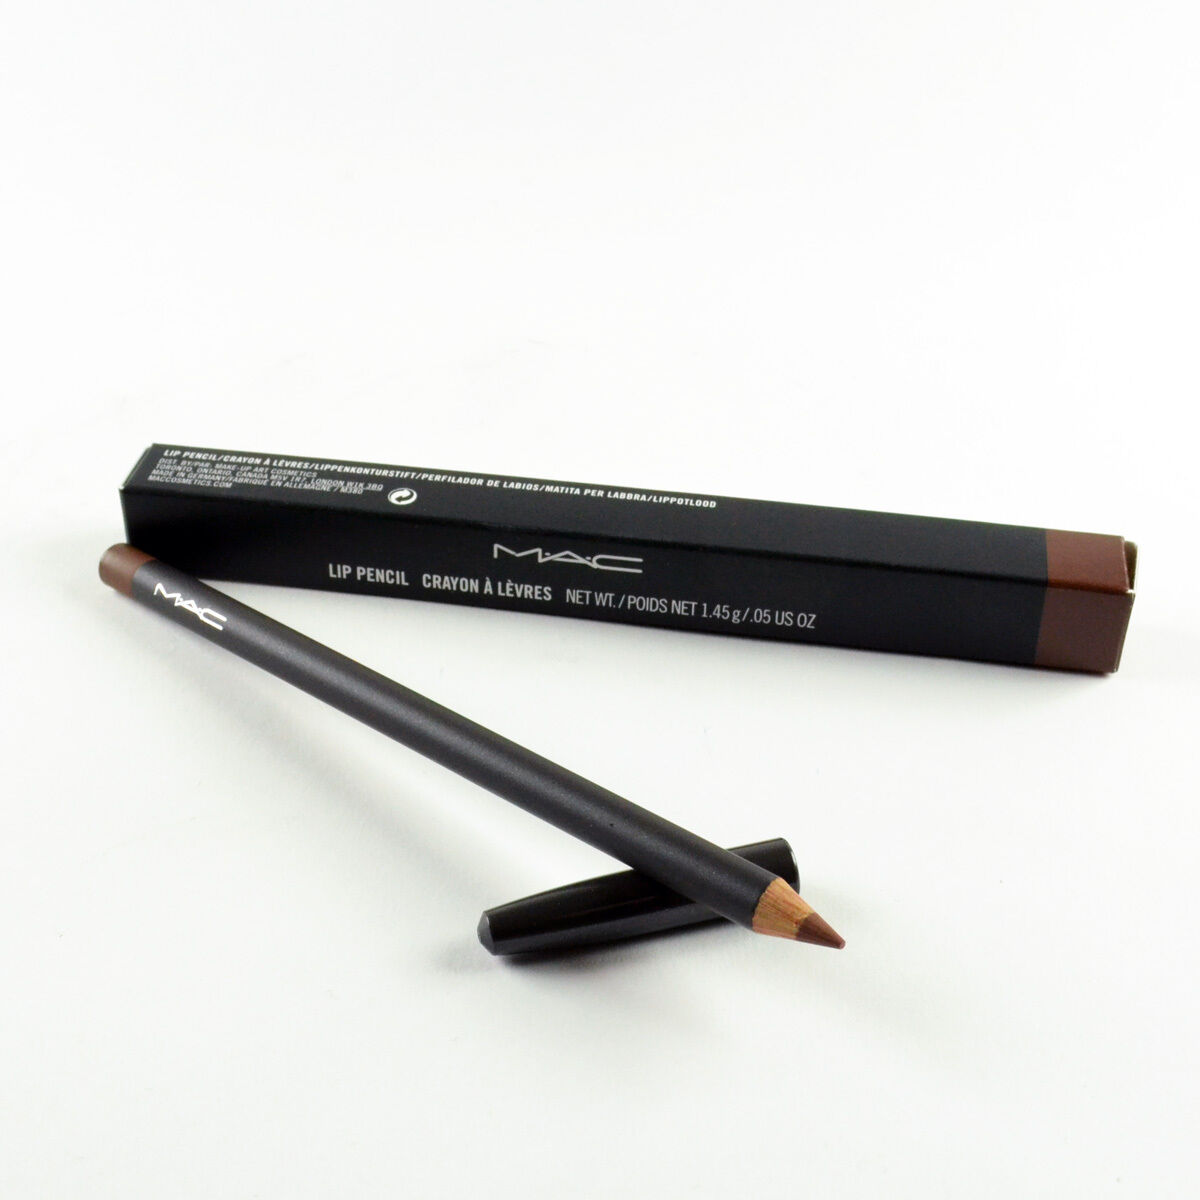 Mac Lip Pencil Lipliner CORK by M.A.C - Full Size 1.45 g / 0